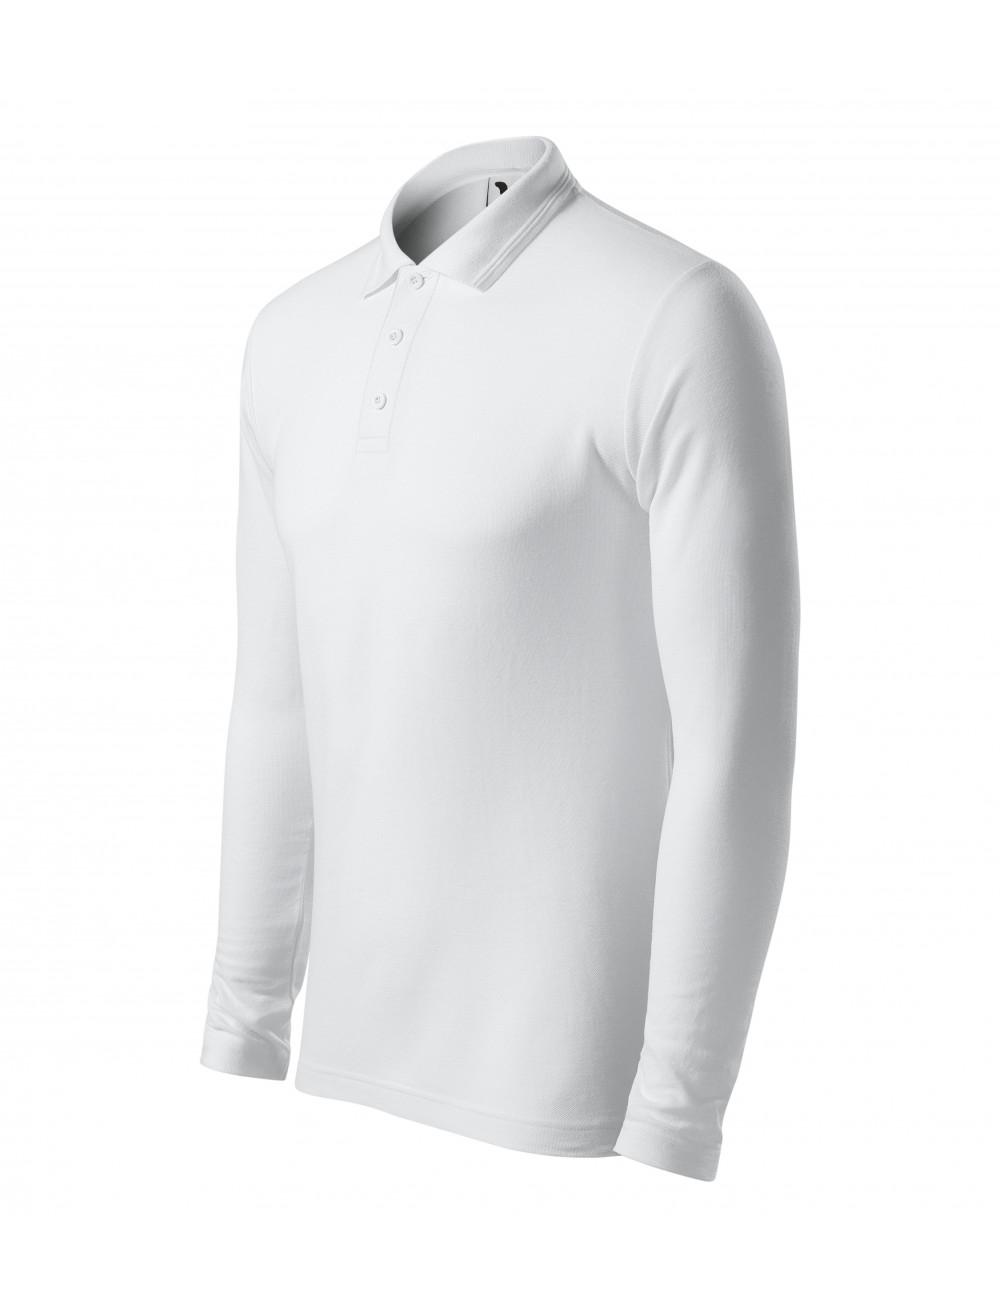 Adler MALFINI Koszulka polo męska Pique Polo LS 221 biały